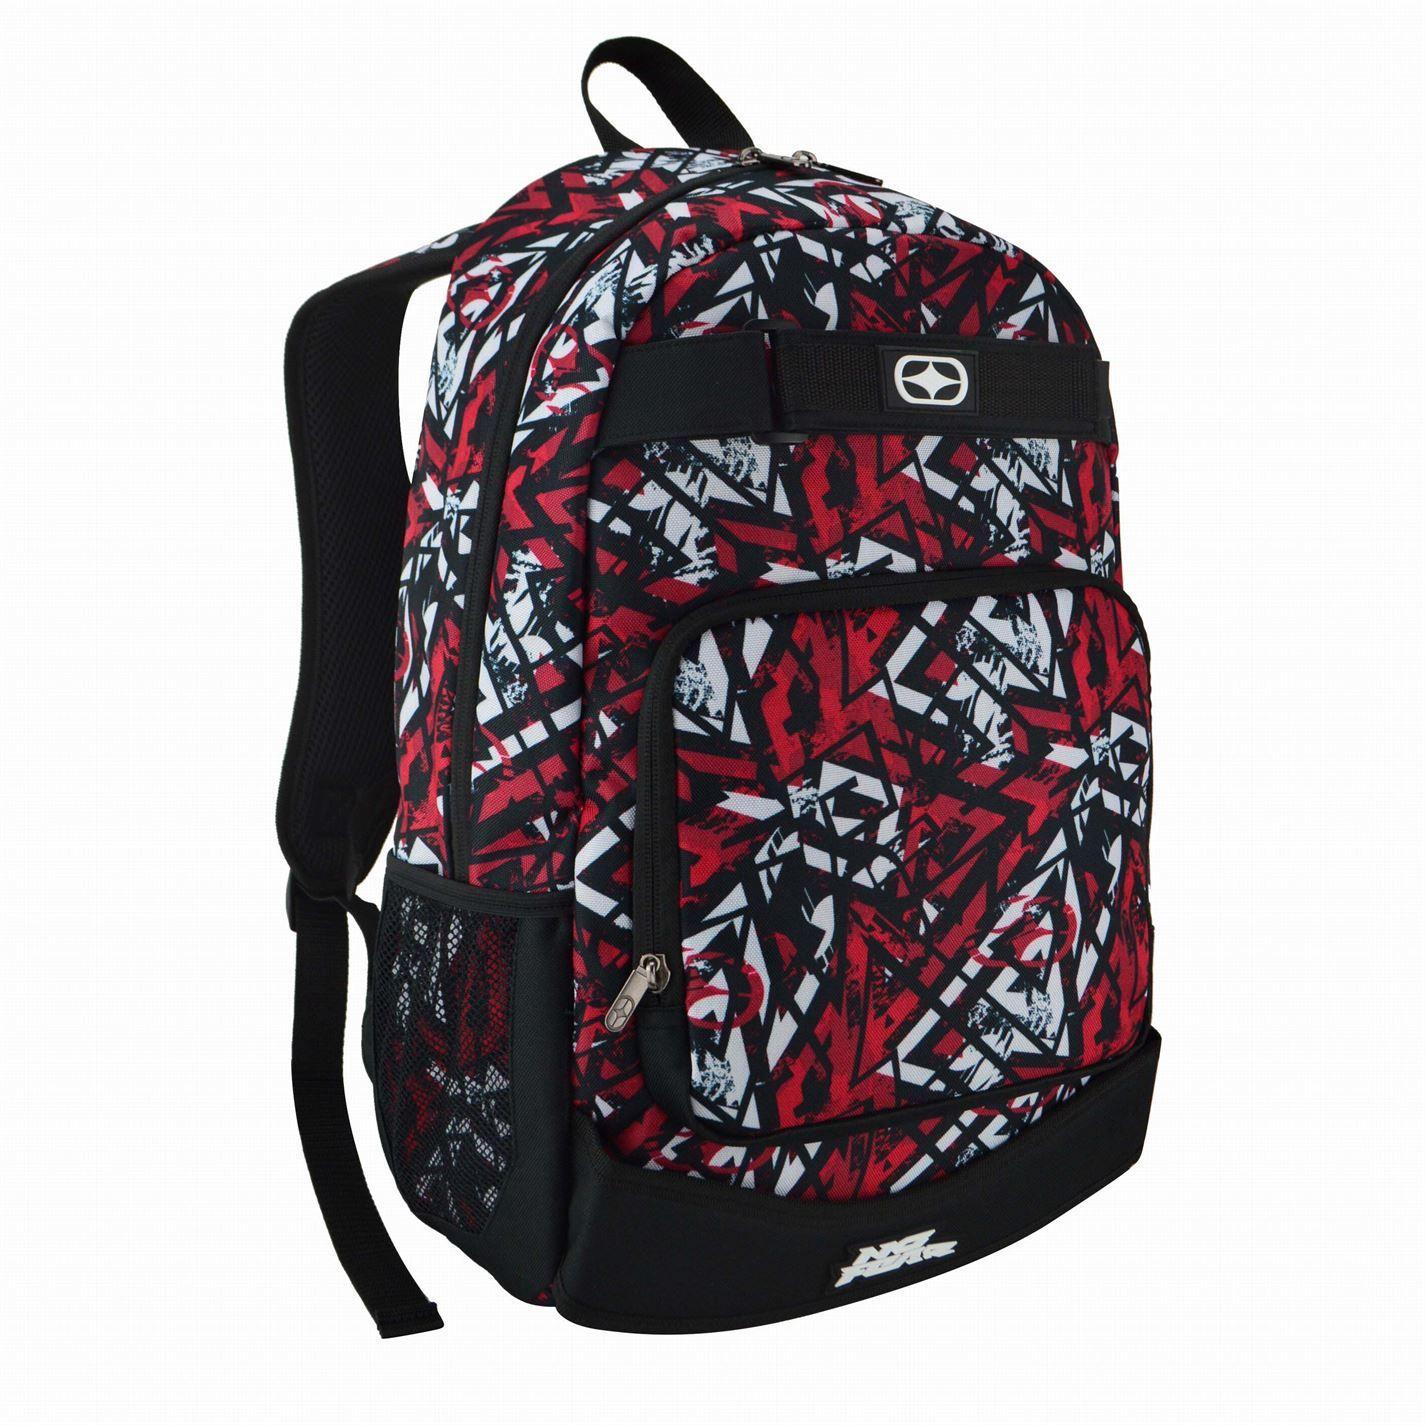 No Fear Print Skate Backpack Bag